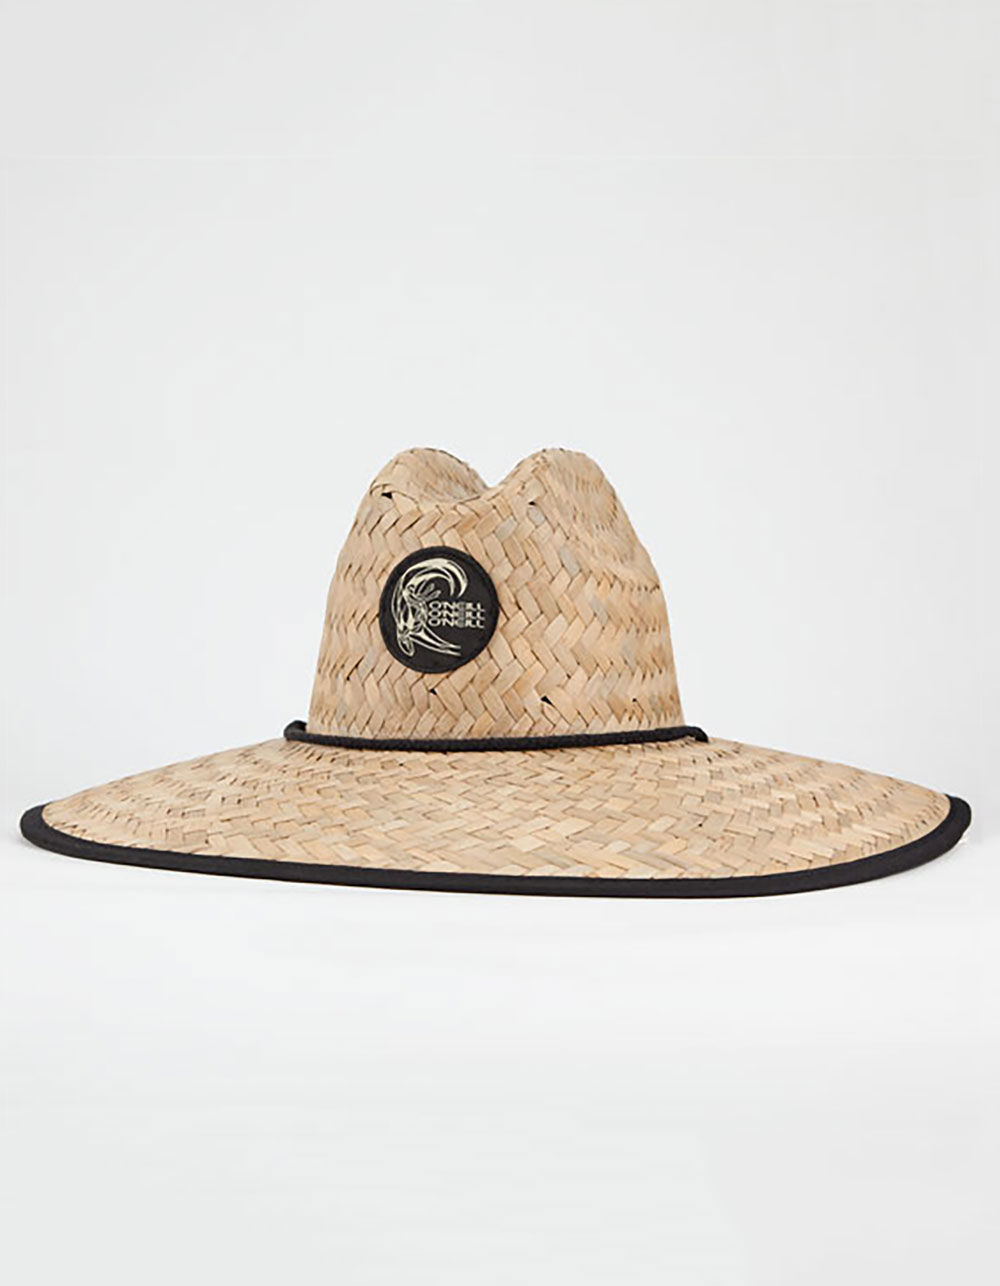 O'NEILL Sonoma Lifeguard Straw Hat